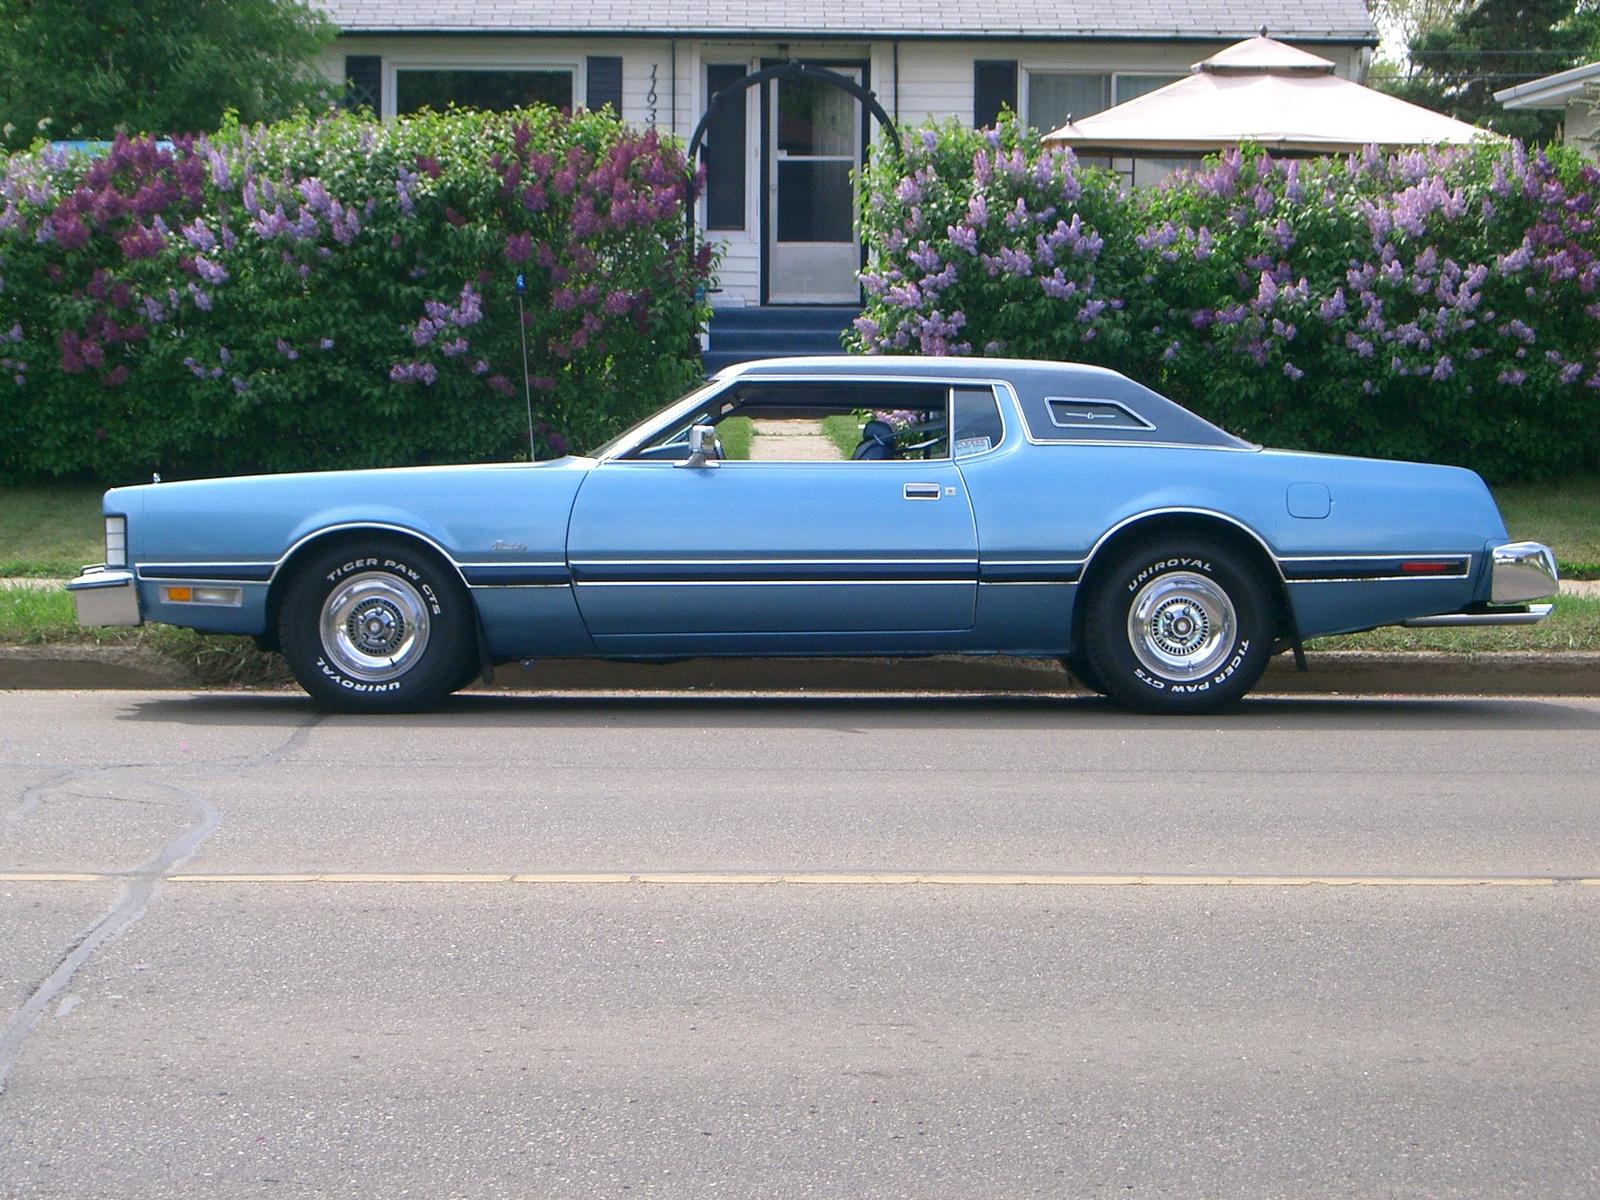 1976 Ford Thunderbird - Pictures - CarGurus